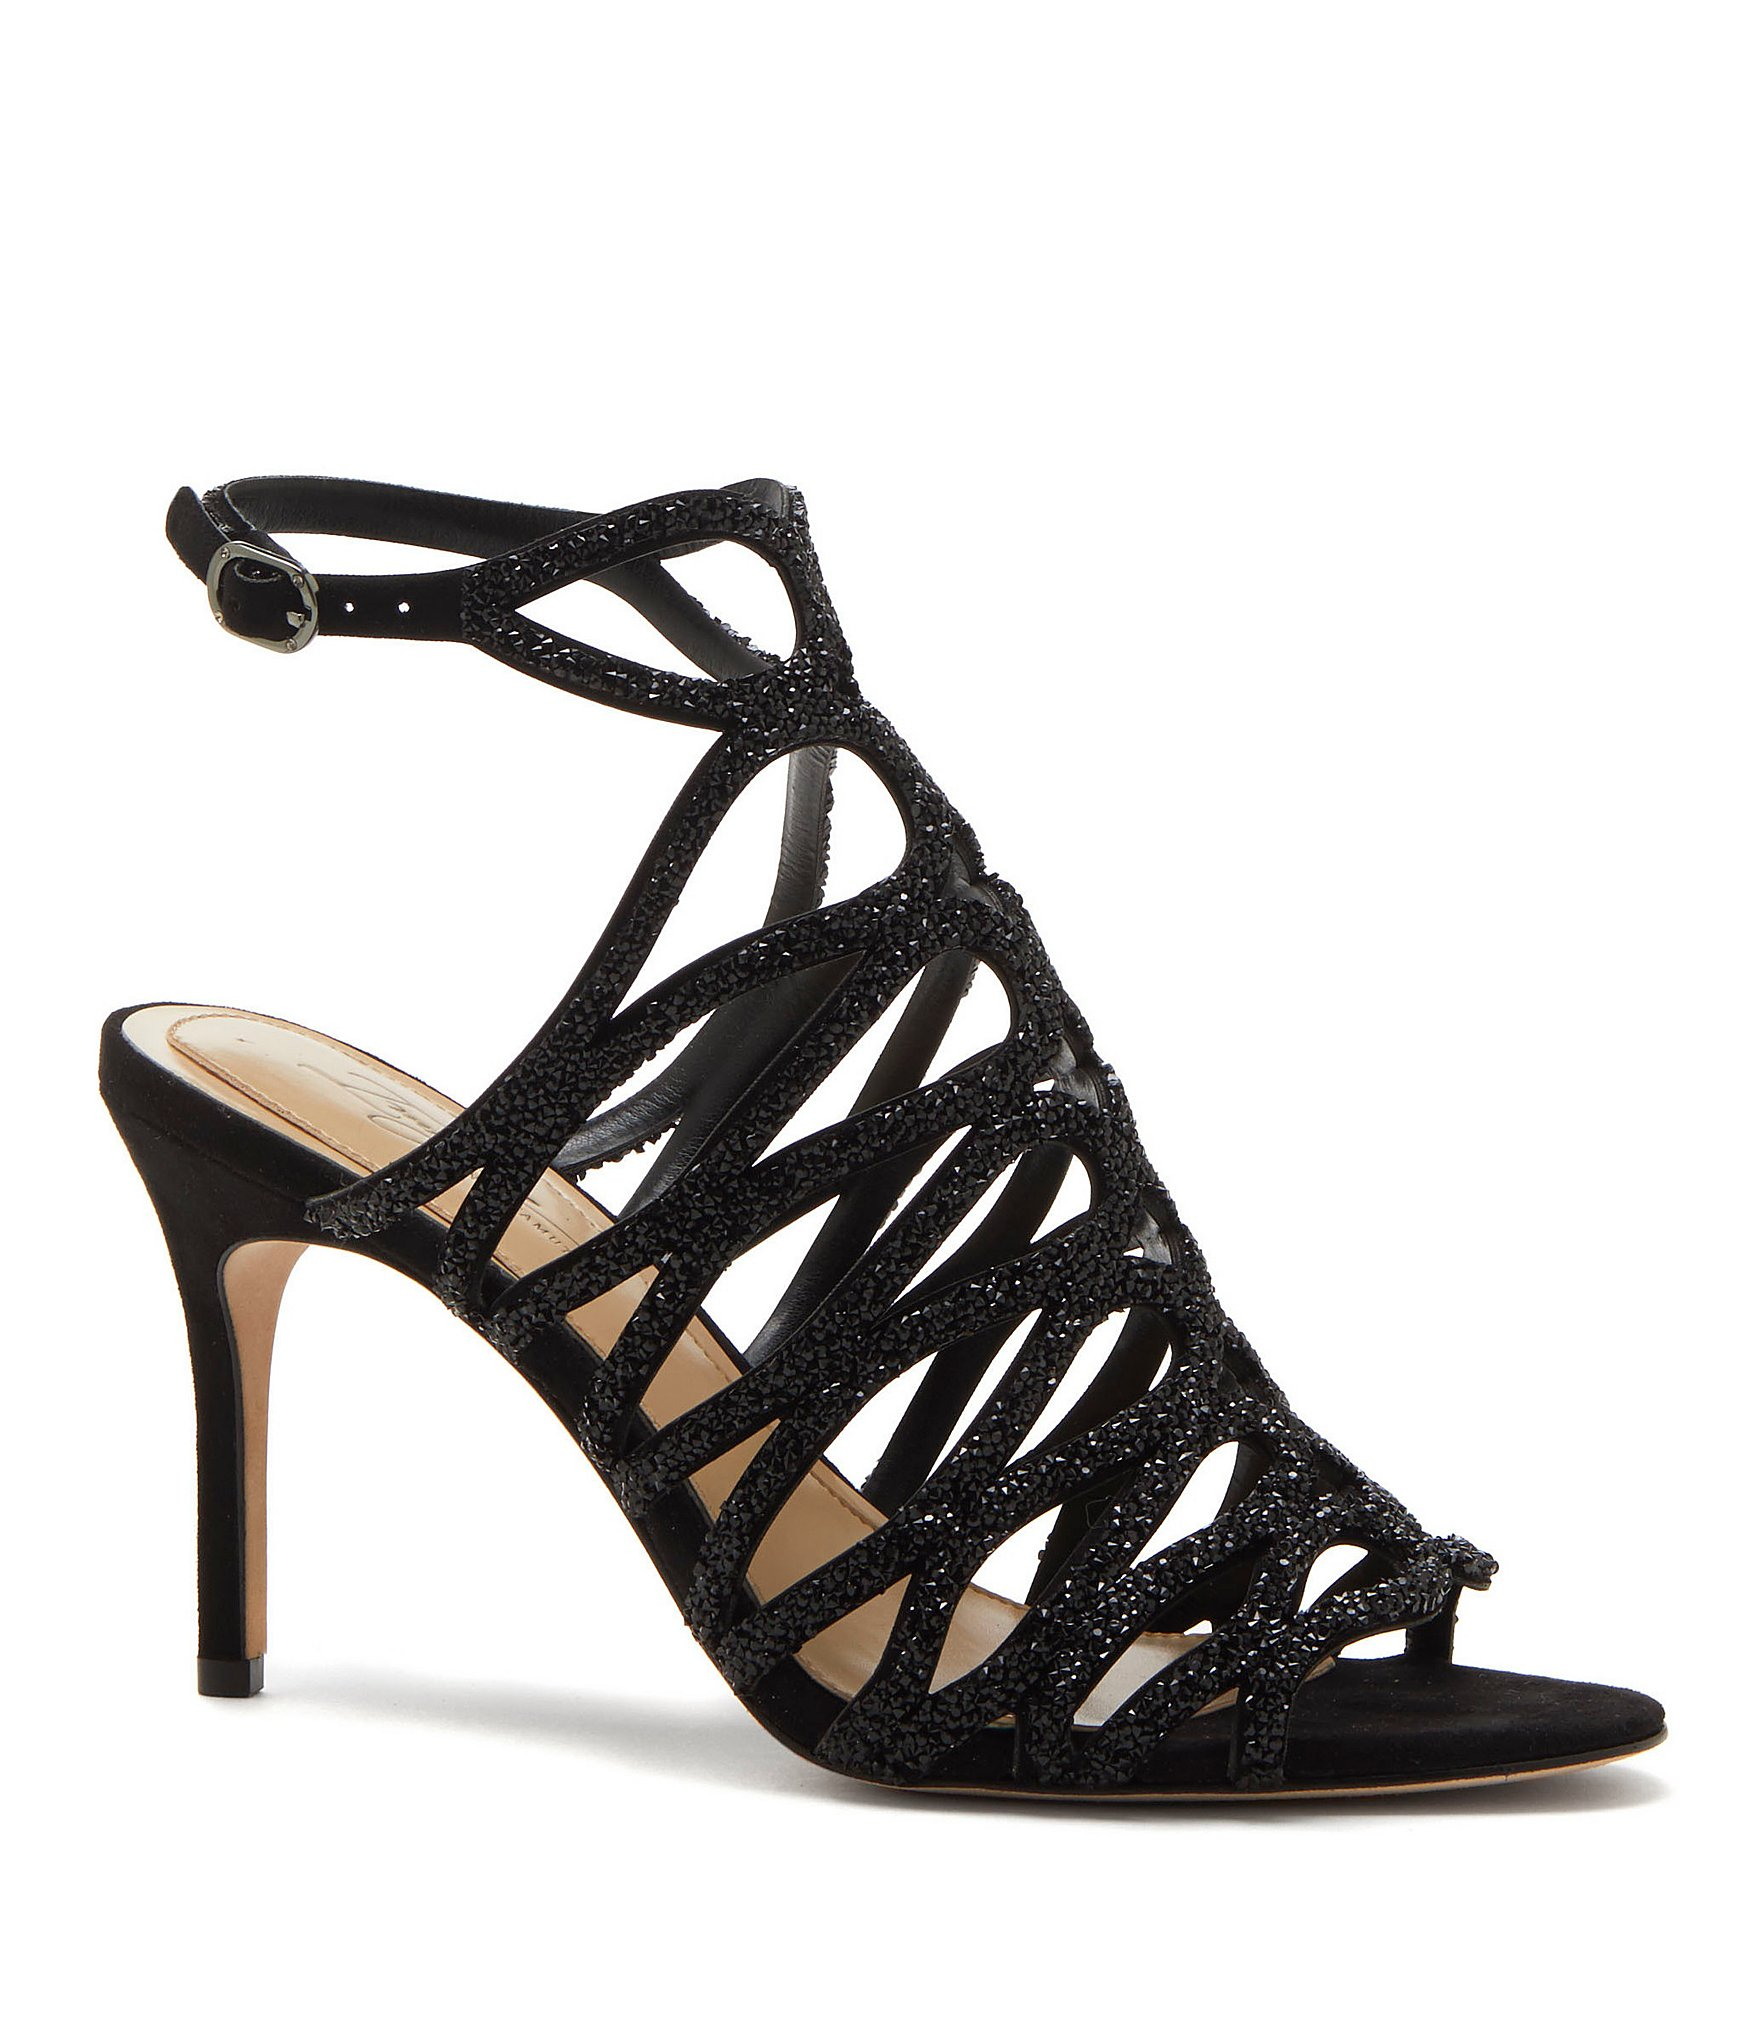 Dillards Vince Camuto Shoes Black